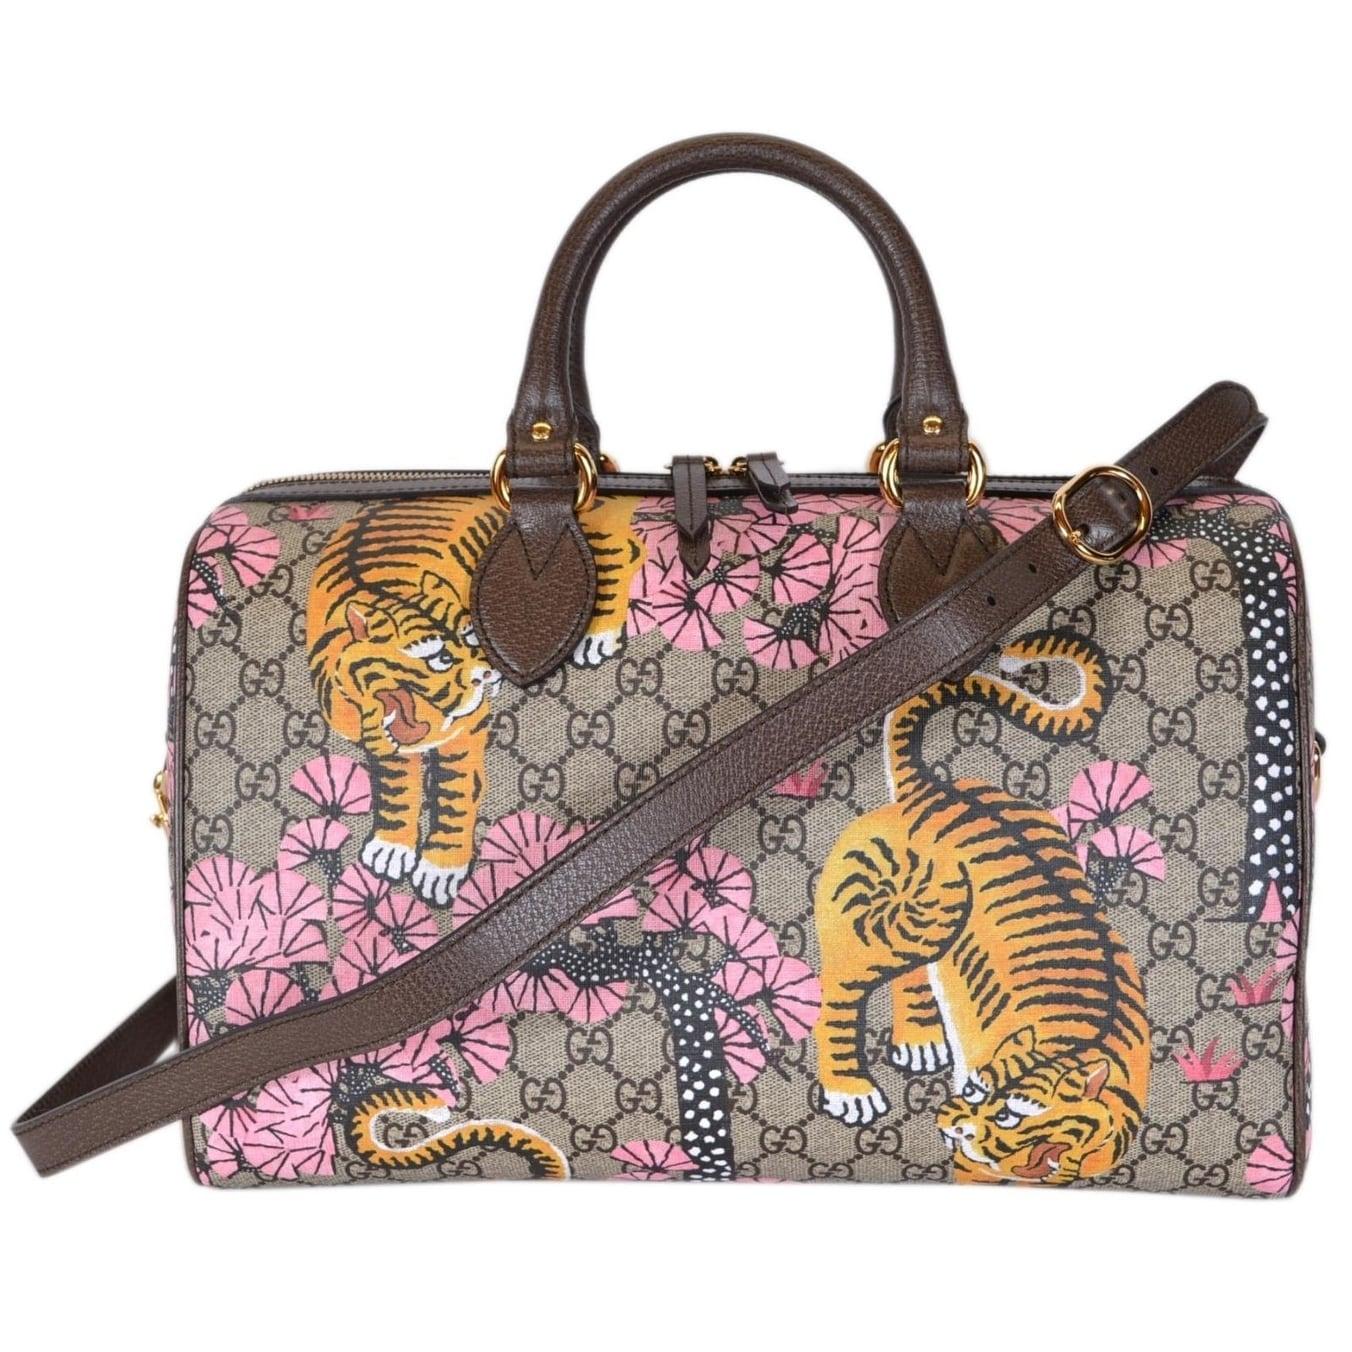 Gucci Women s 409527 GG Supreme Bengal Tiger Convertible Boston Bag Purse -  Multi - 14